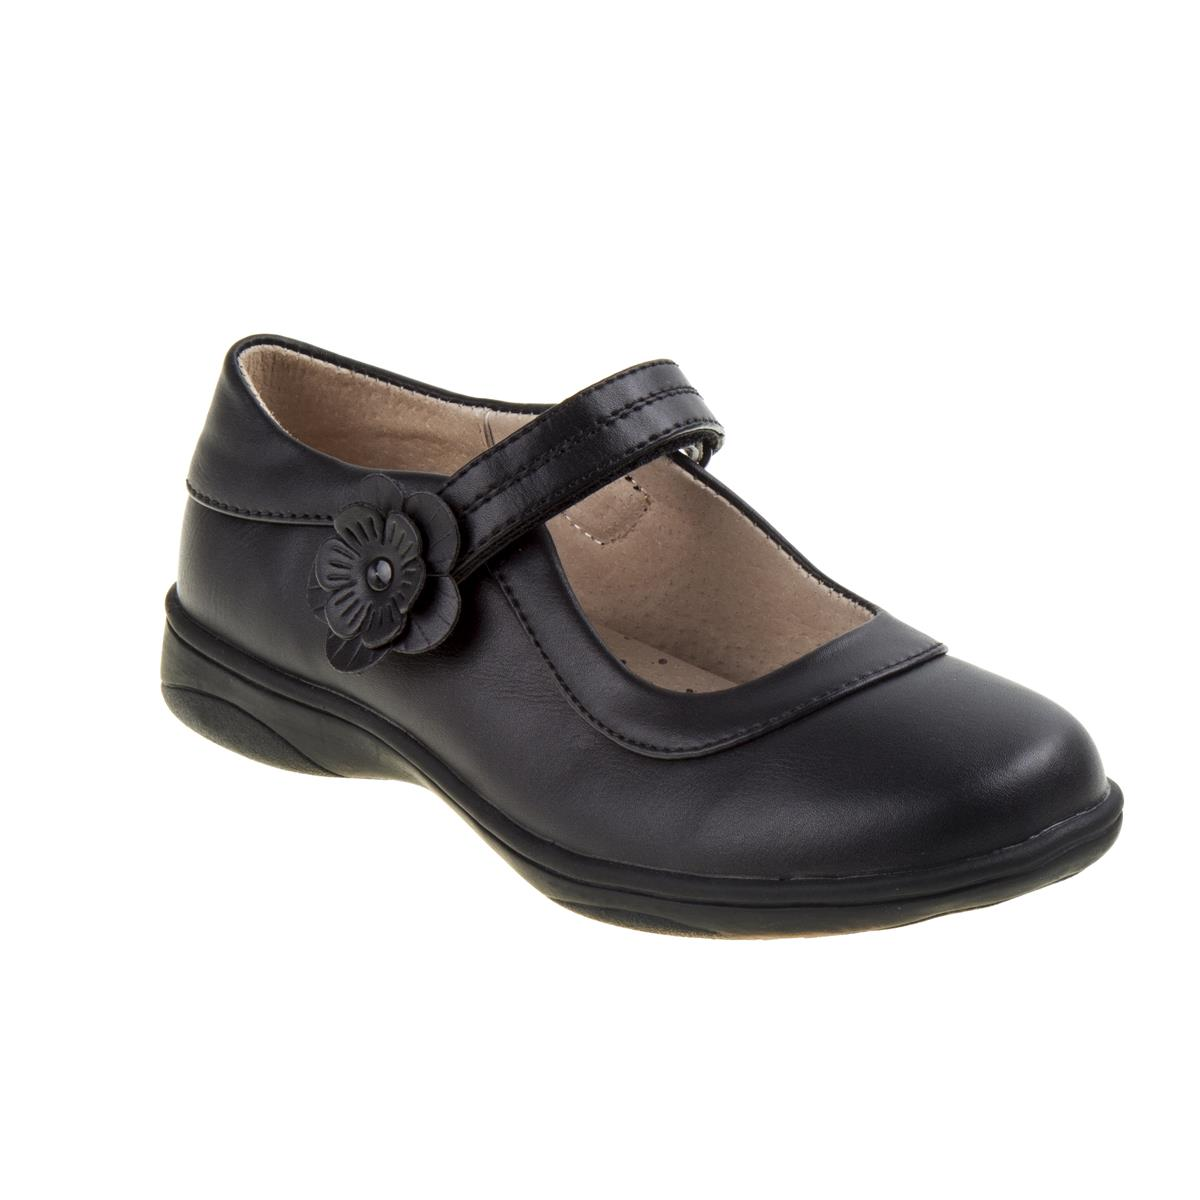 *Black Ankle Strap